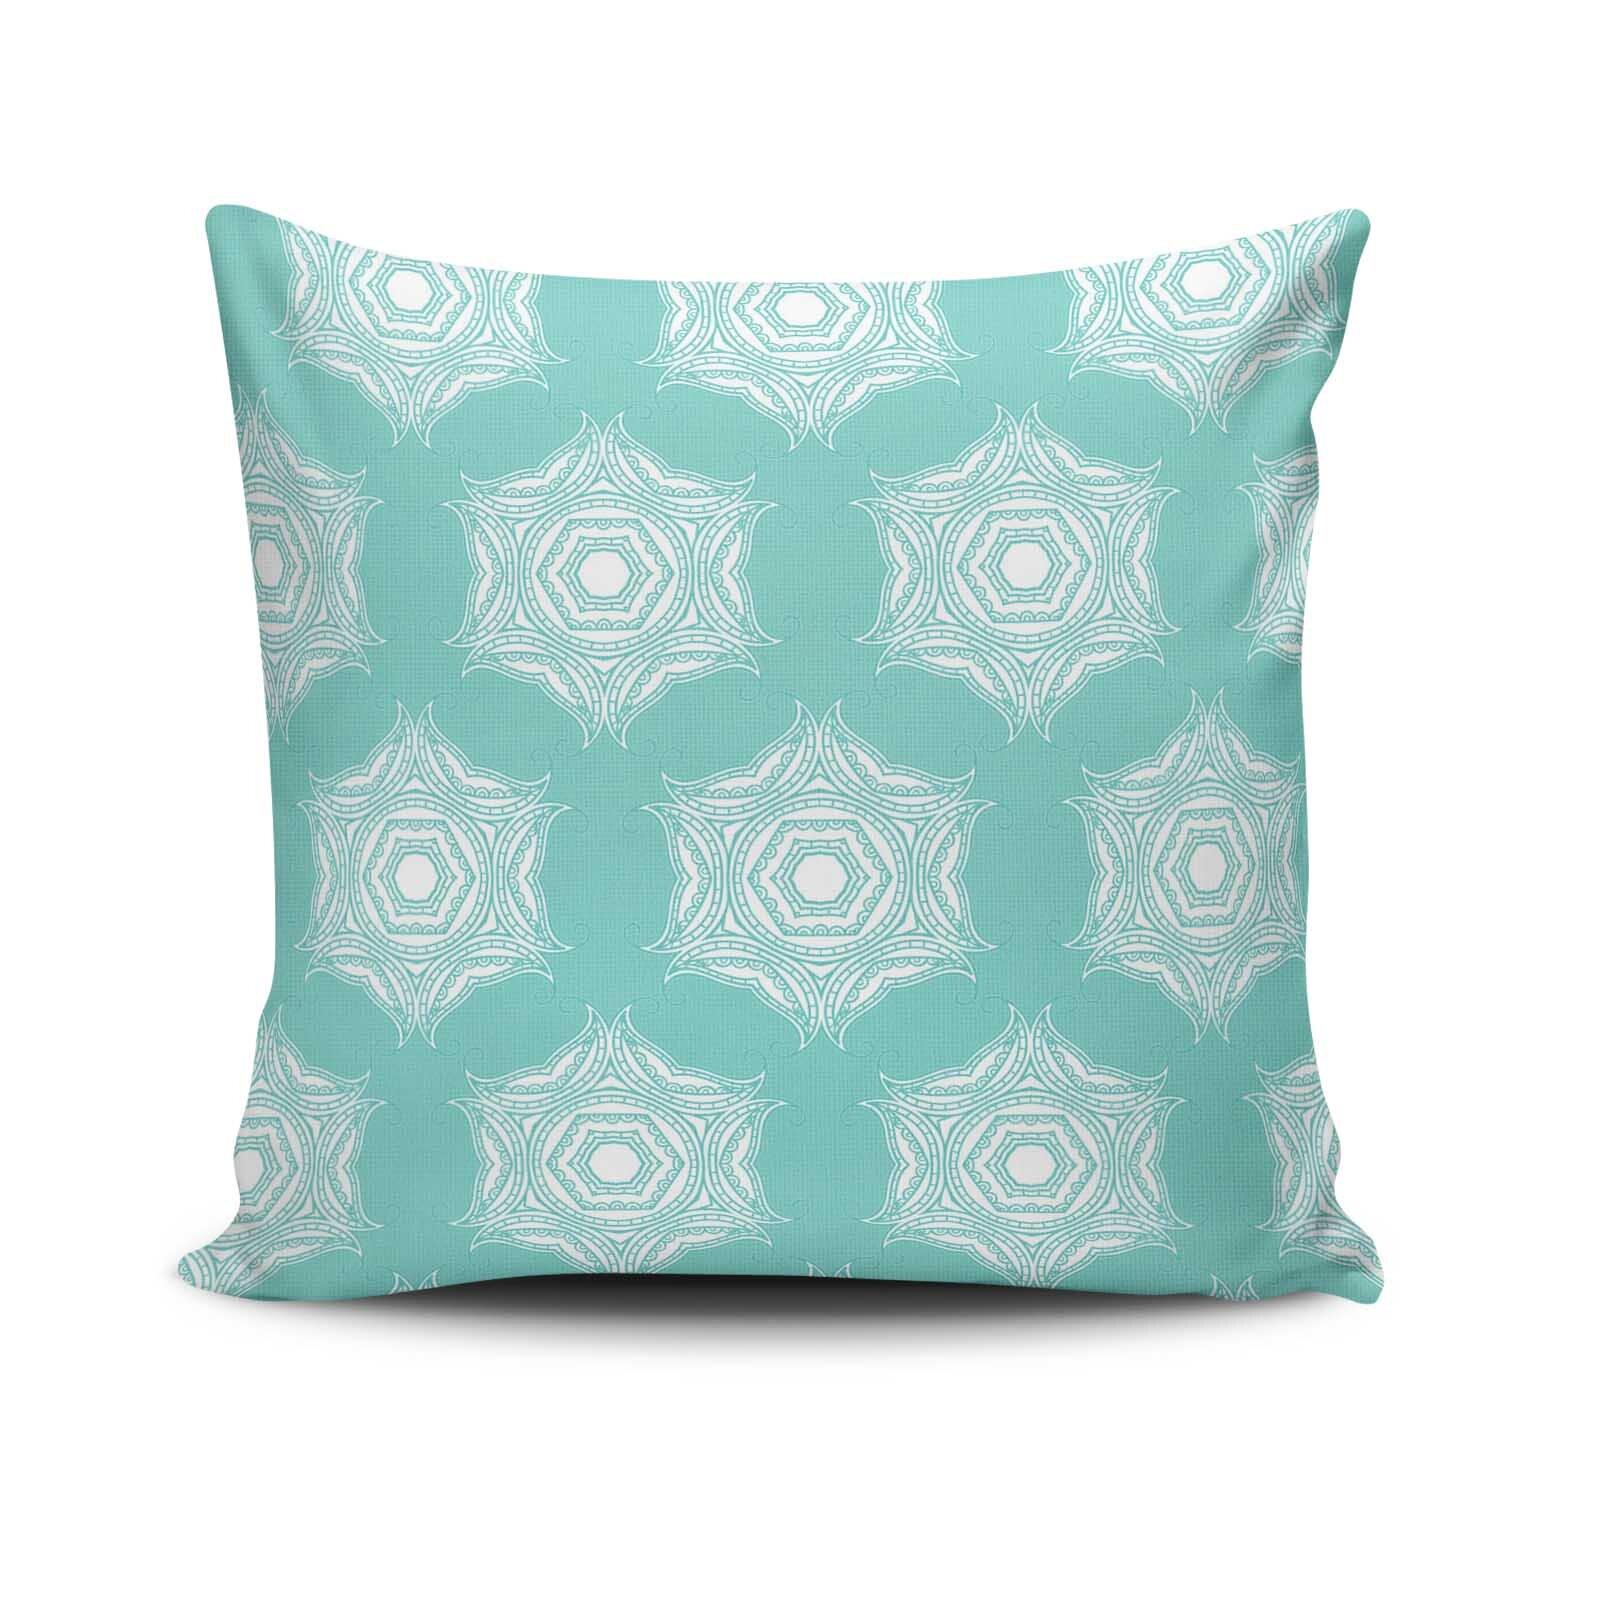 Perna decorativa Cushion Love, Dimensiune: 45 x 45 cm, Material exterior: 50% bumbac / 50% poliester 768CLV0238